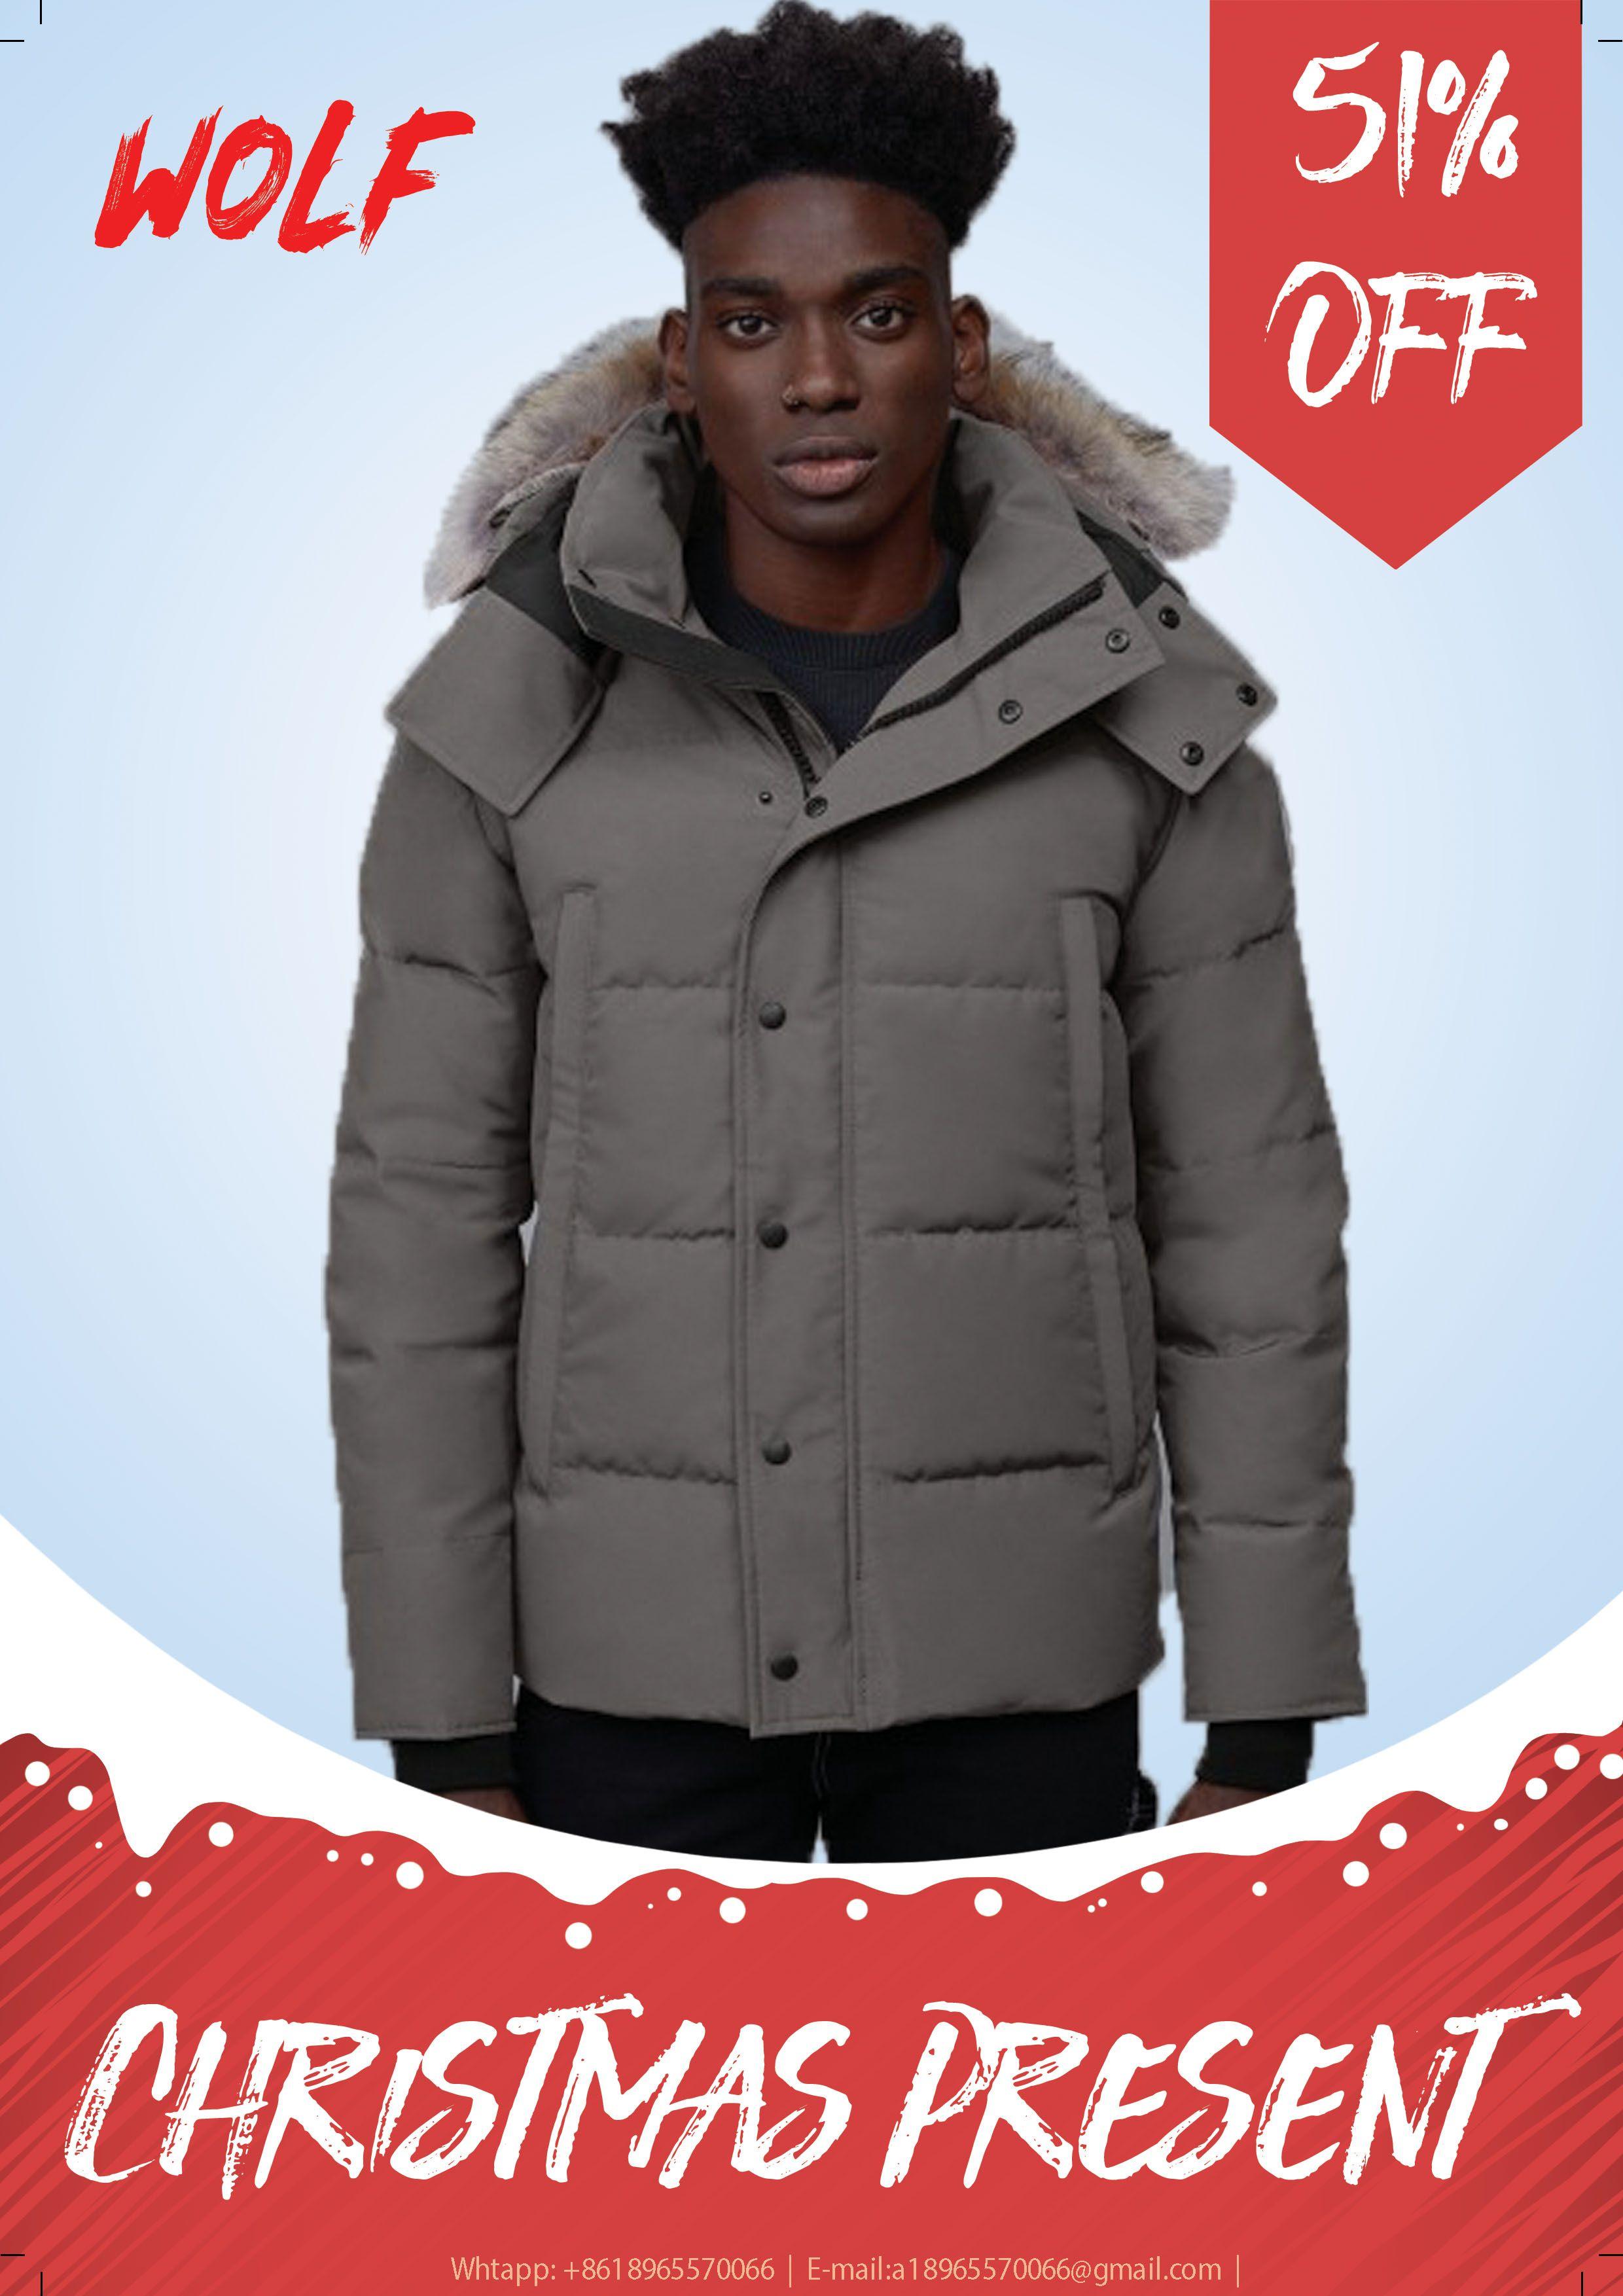 Üst Erkekler Kış Ceket Kurt Fu Seyahat Parka Aşağı Ceket Uzun Parka Kirpon Coats Sıcak Palto Jaqueta Mont Dış Giyim